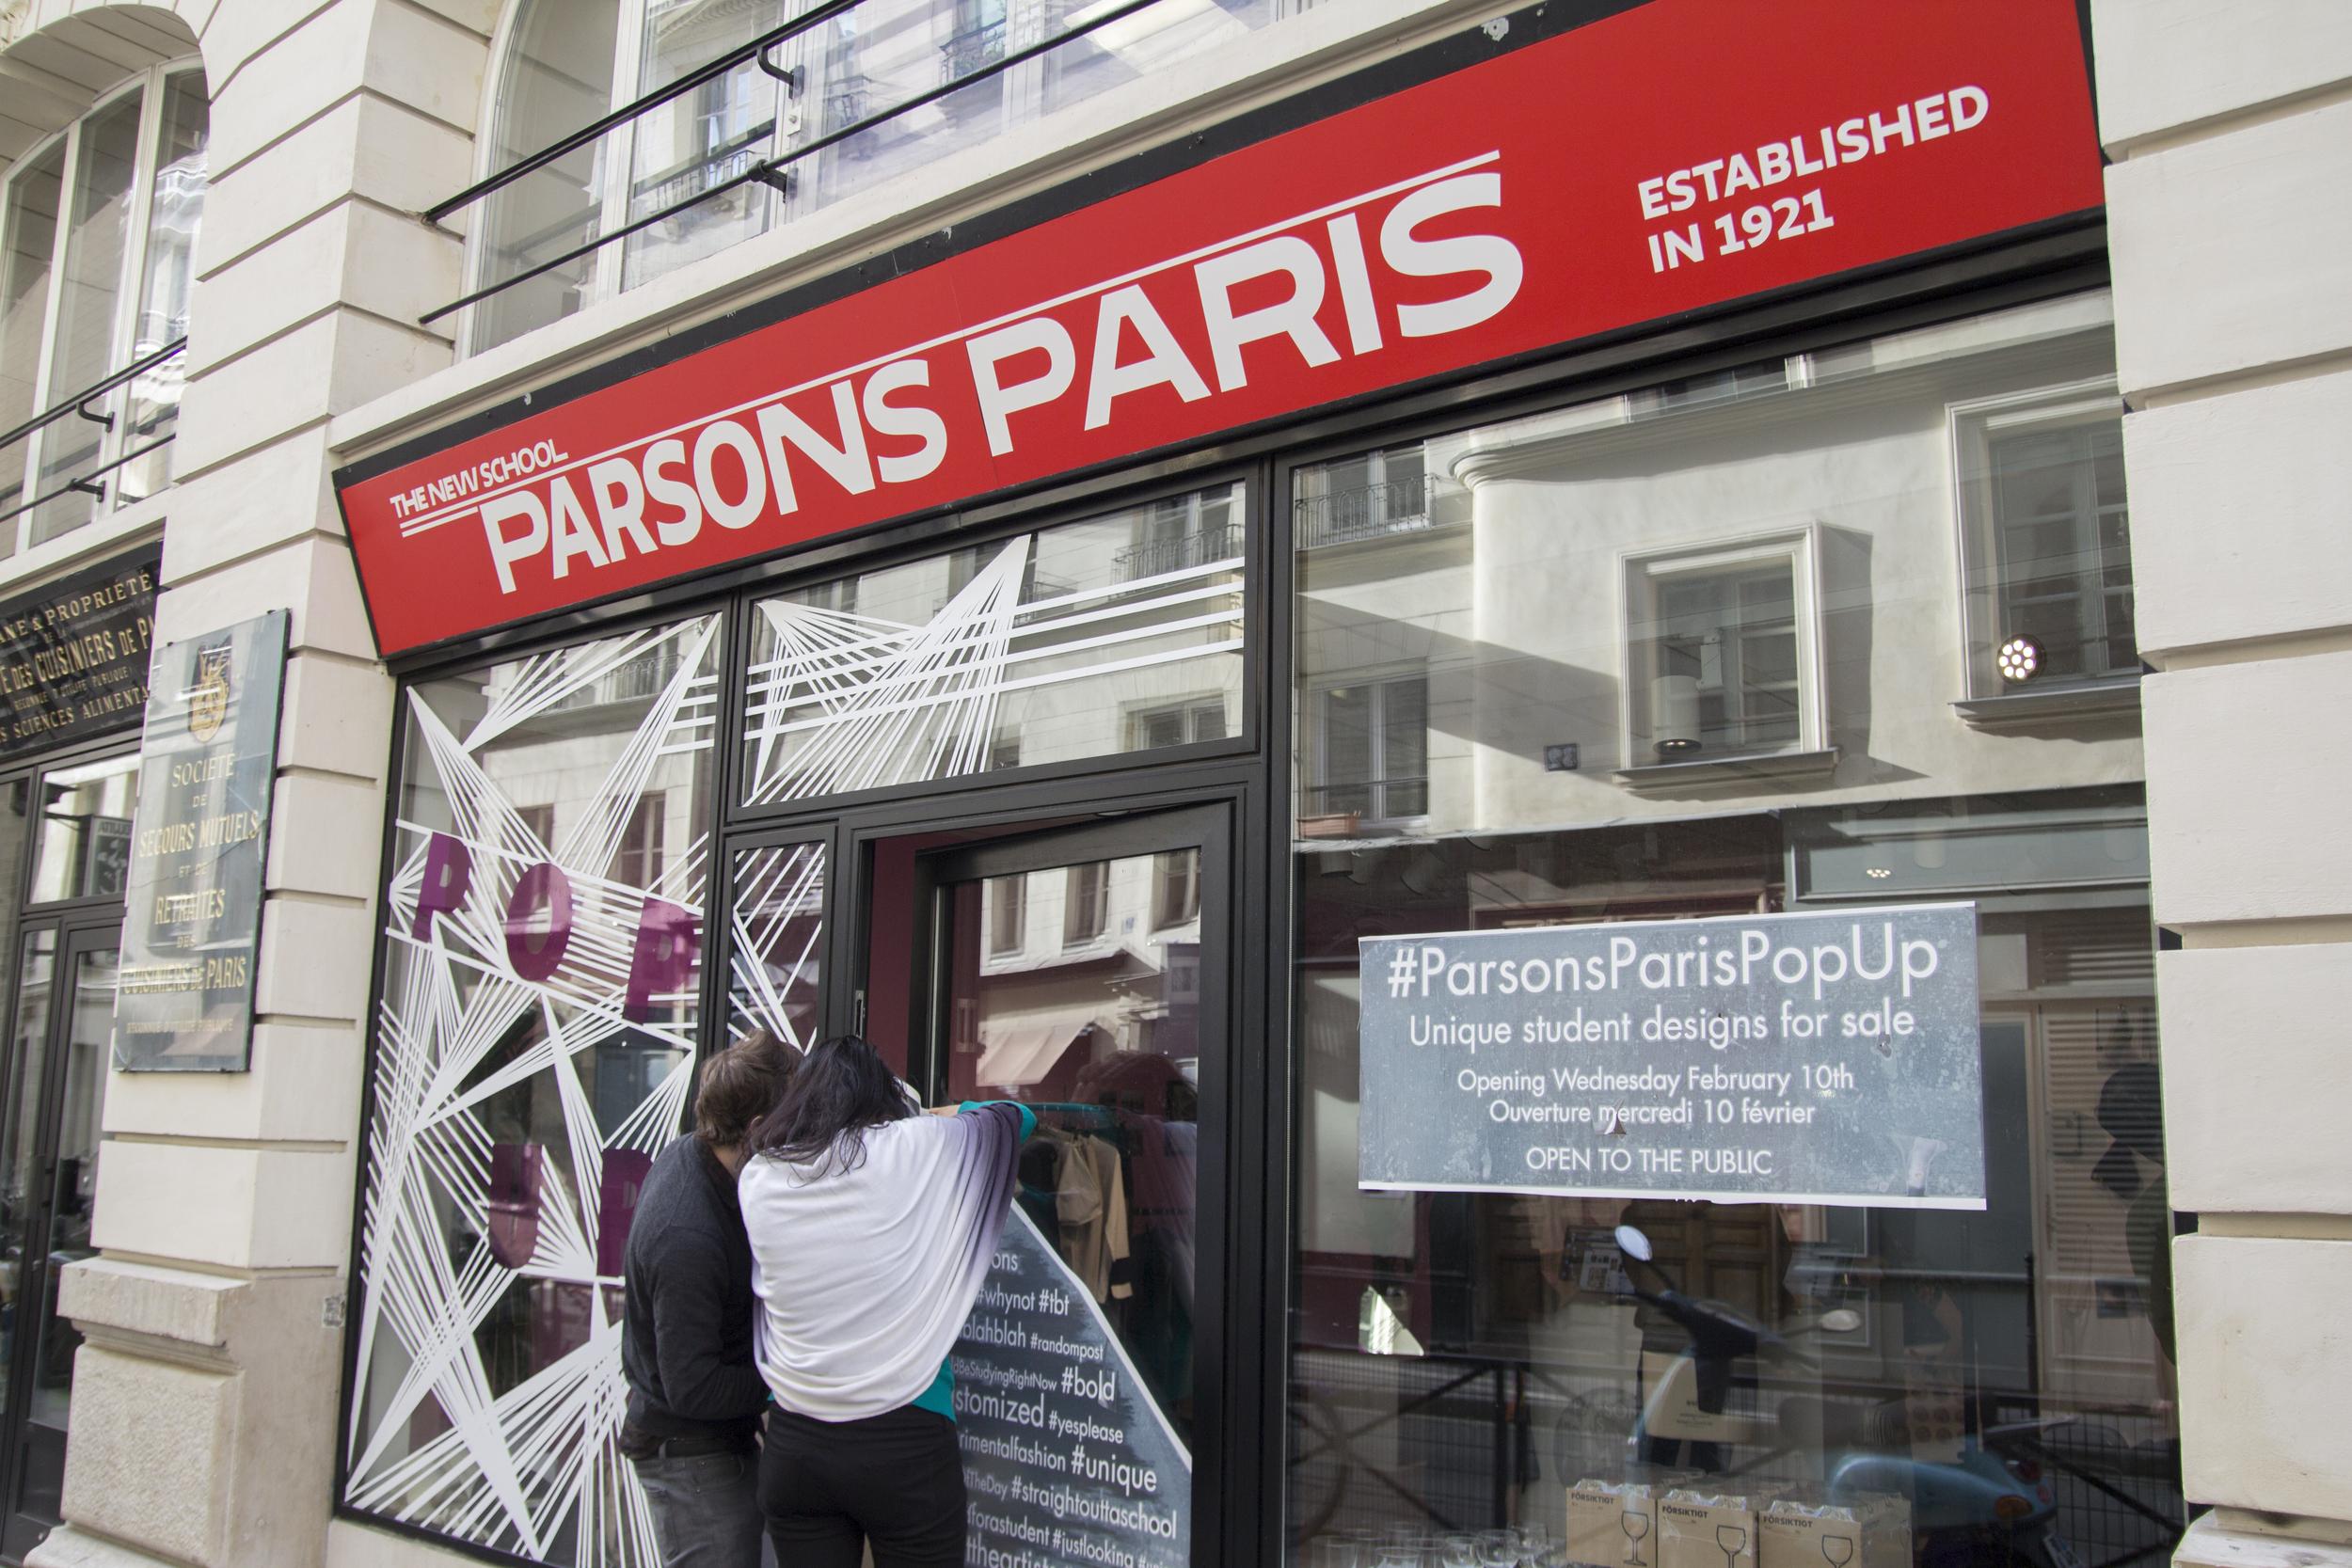 Parsons Paris Pop Up _February_2016_70.jpg